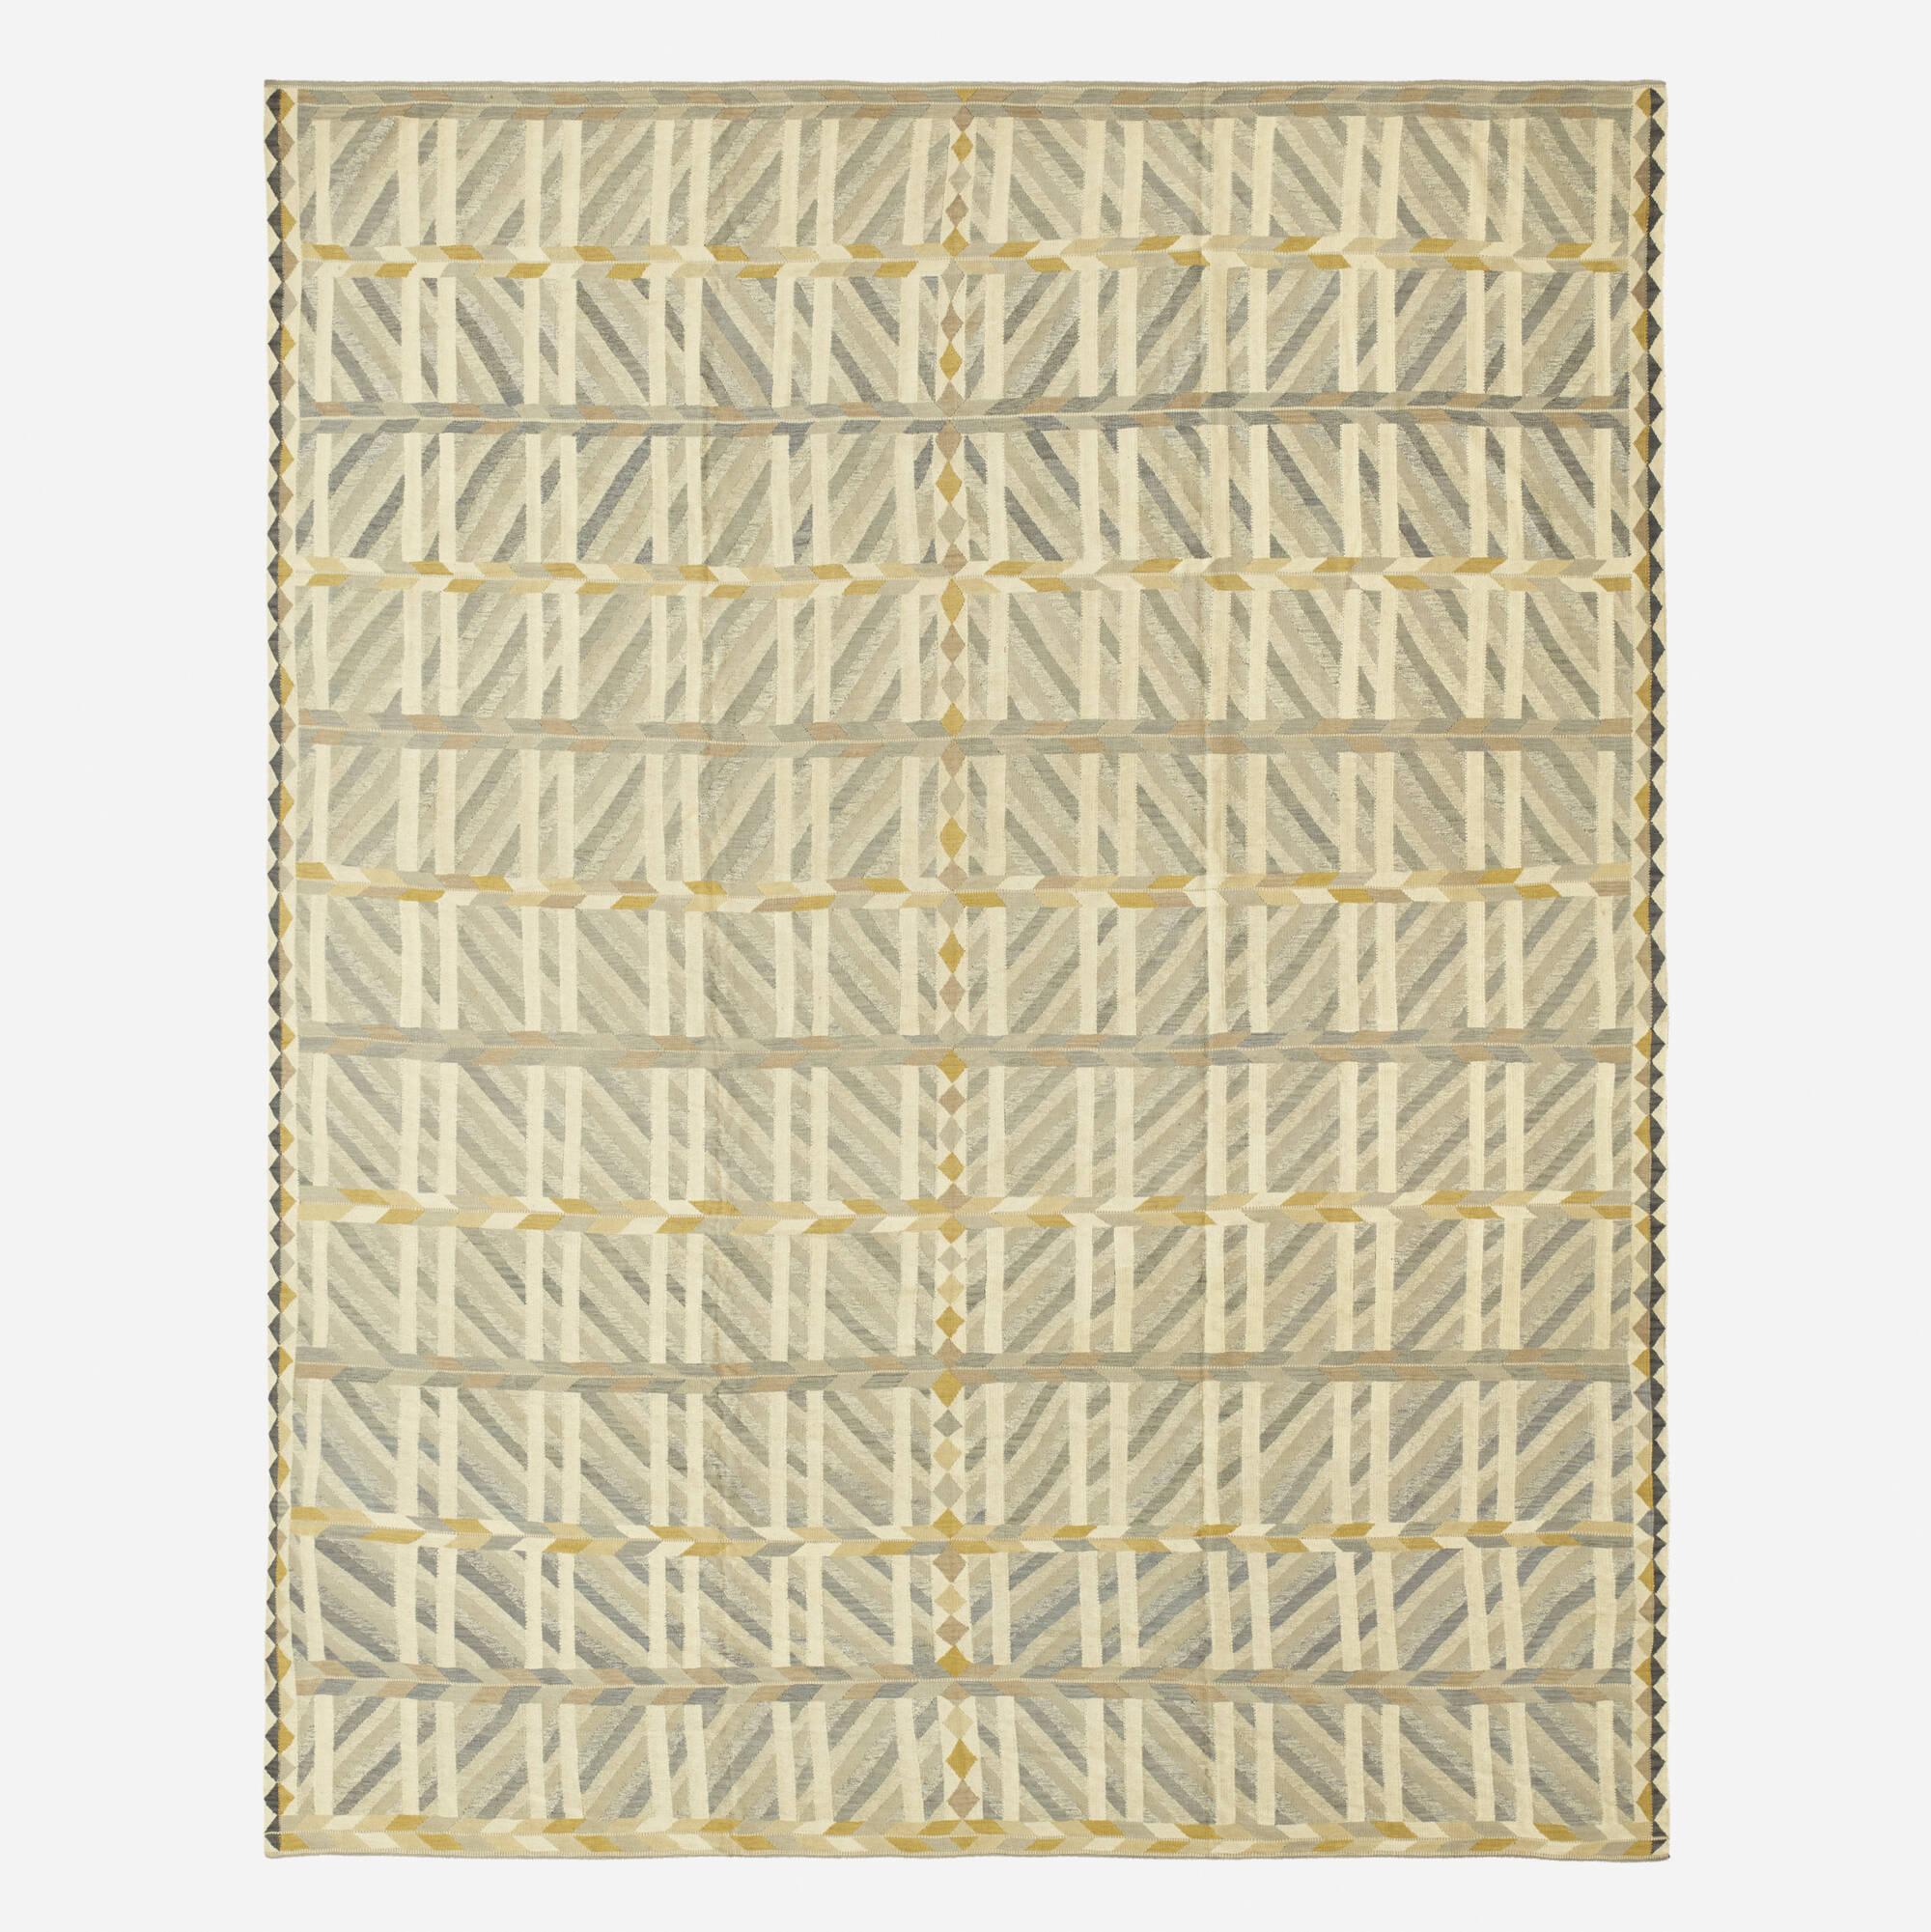 290: Swedish / contemporary flatweave carpet (1 of 2)